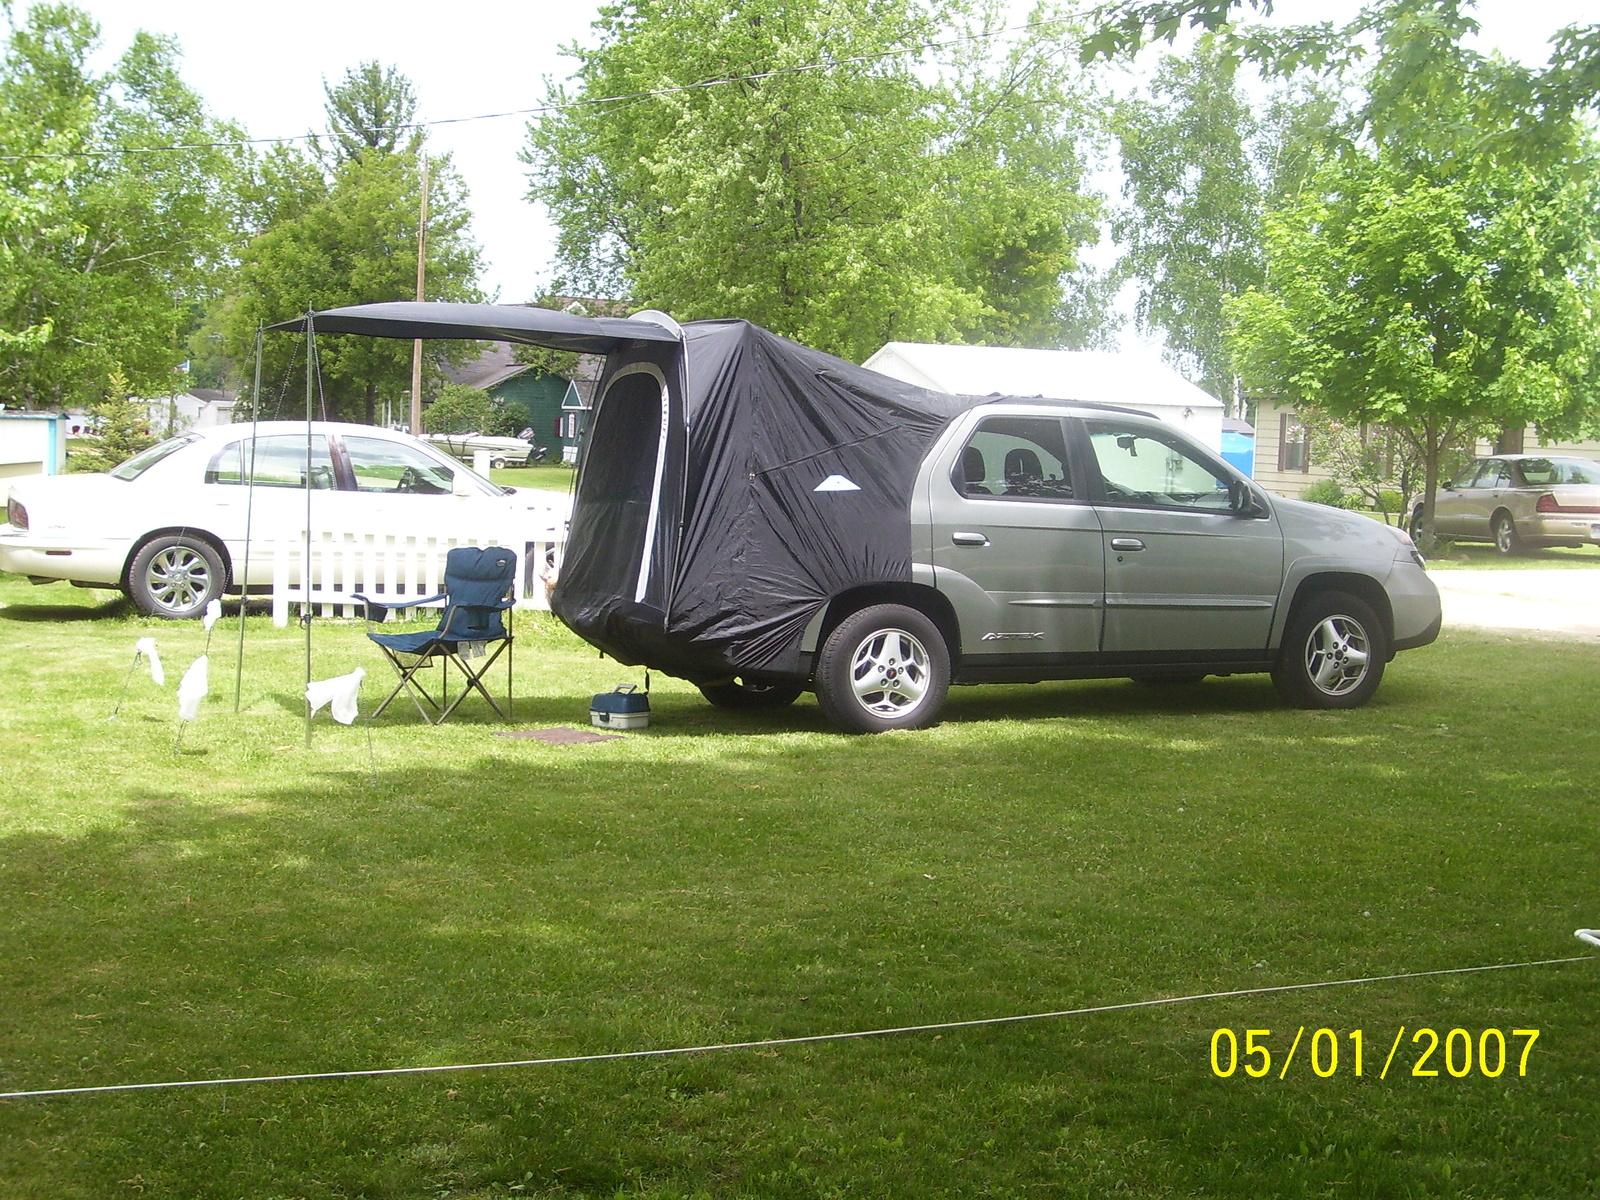 2003 Pontiac Aztek Image 2